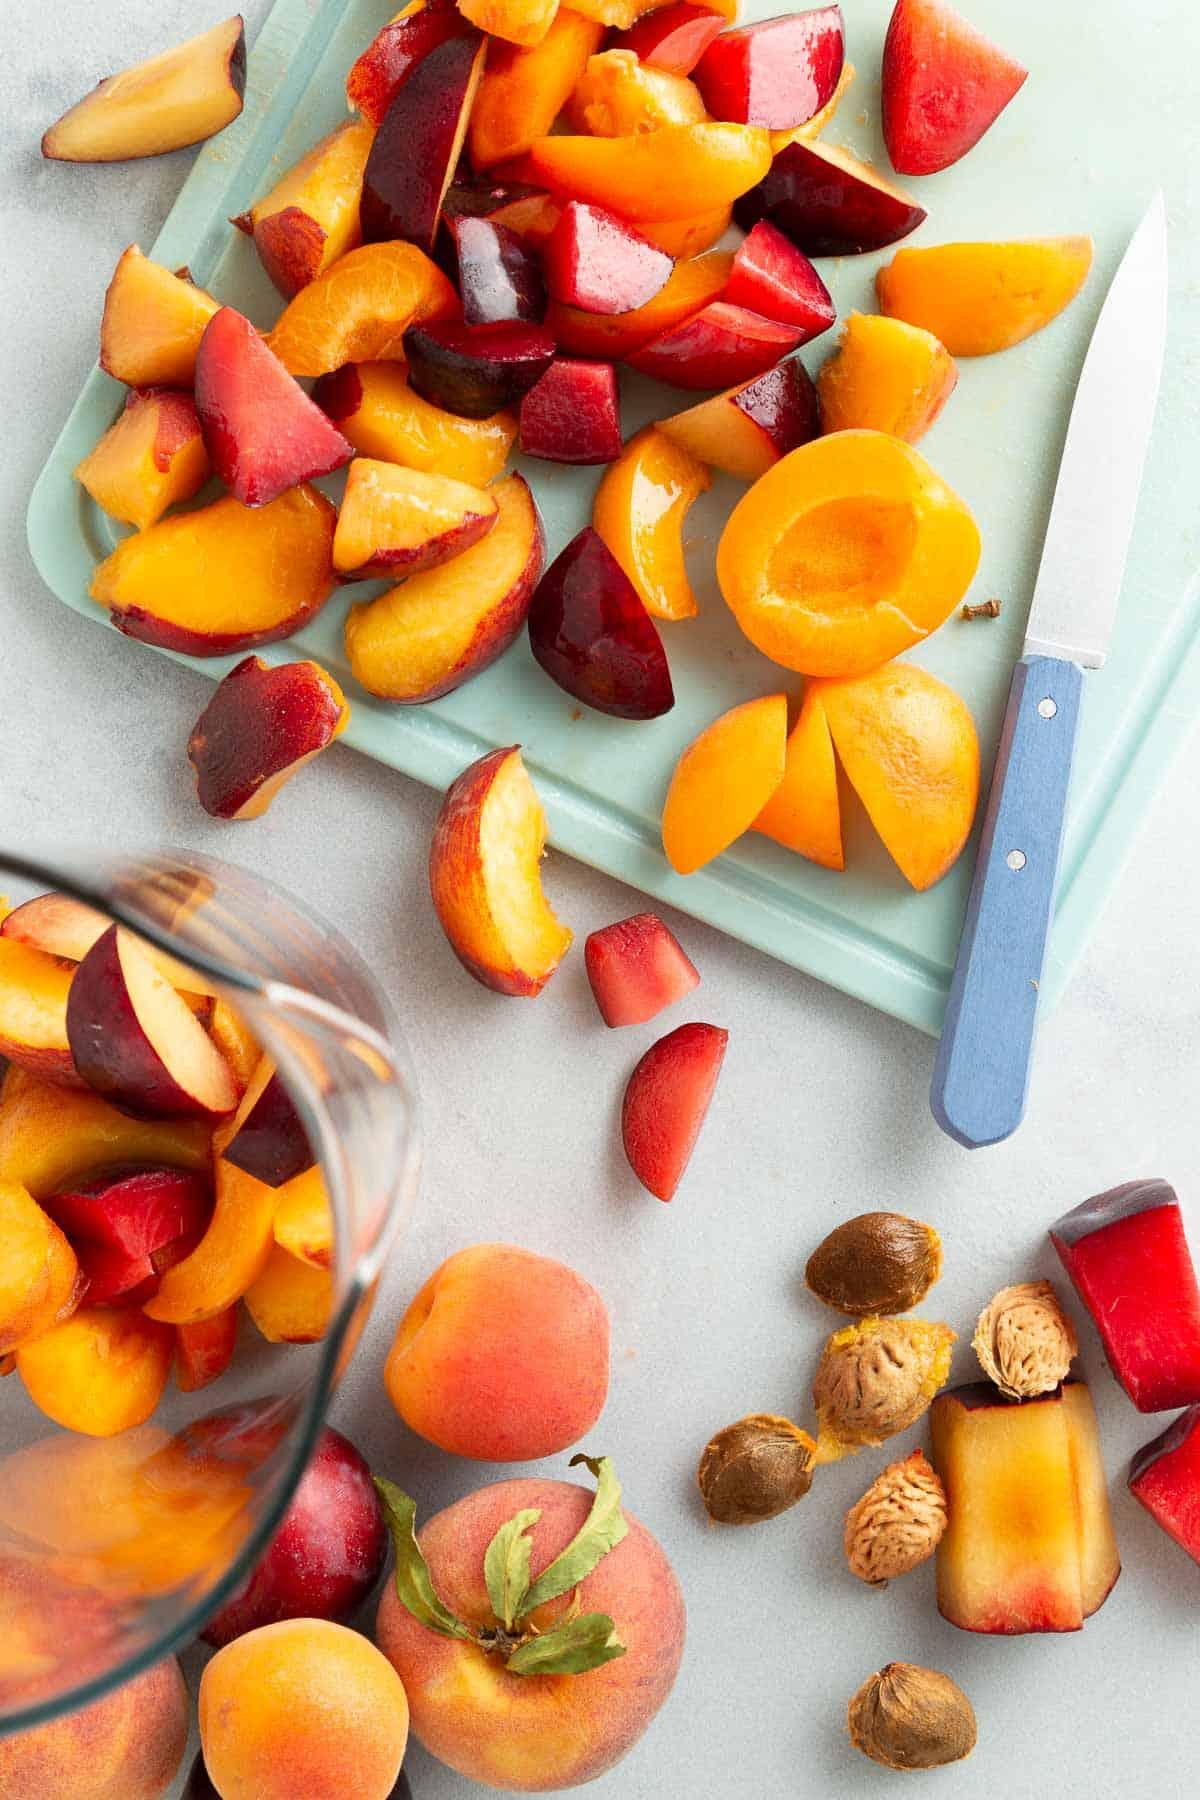 Cutting peaches on a teal cutting board